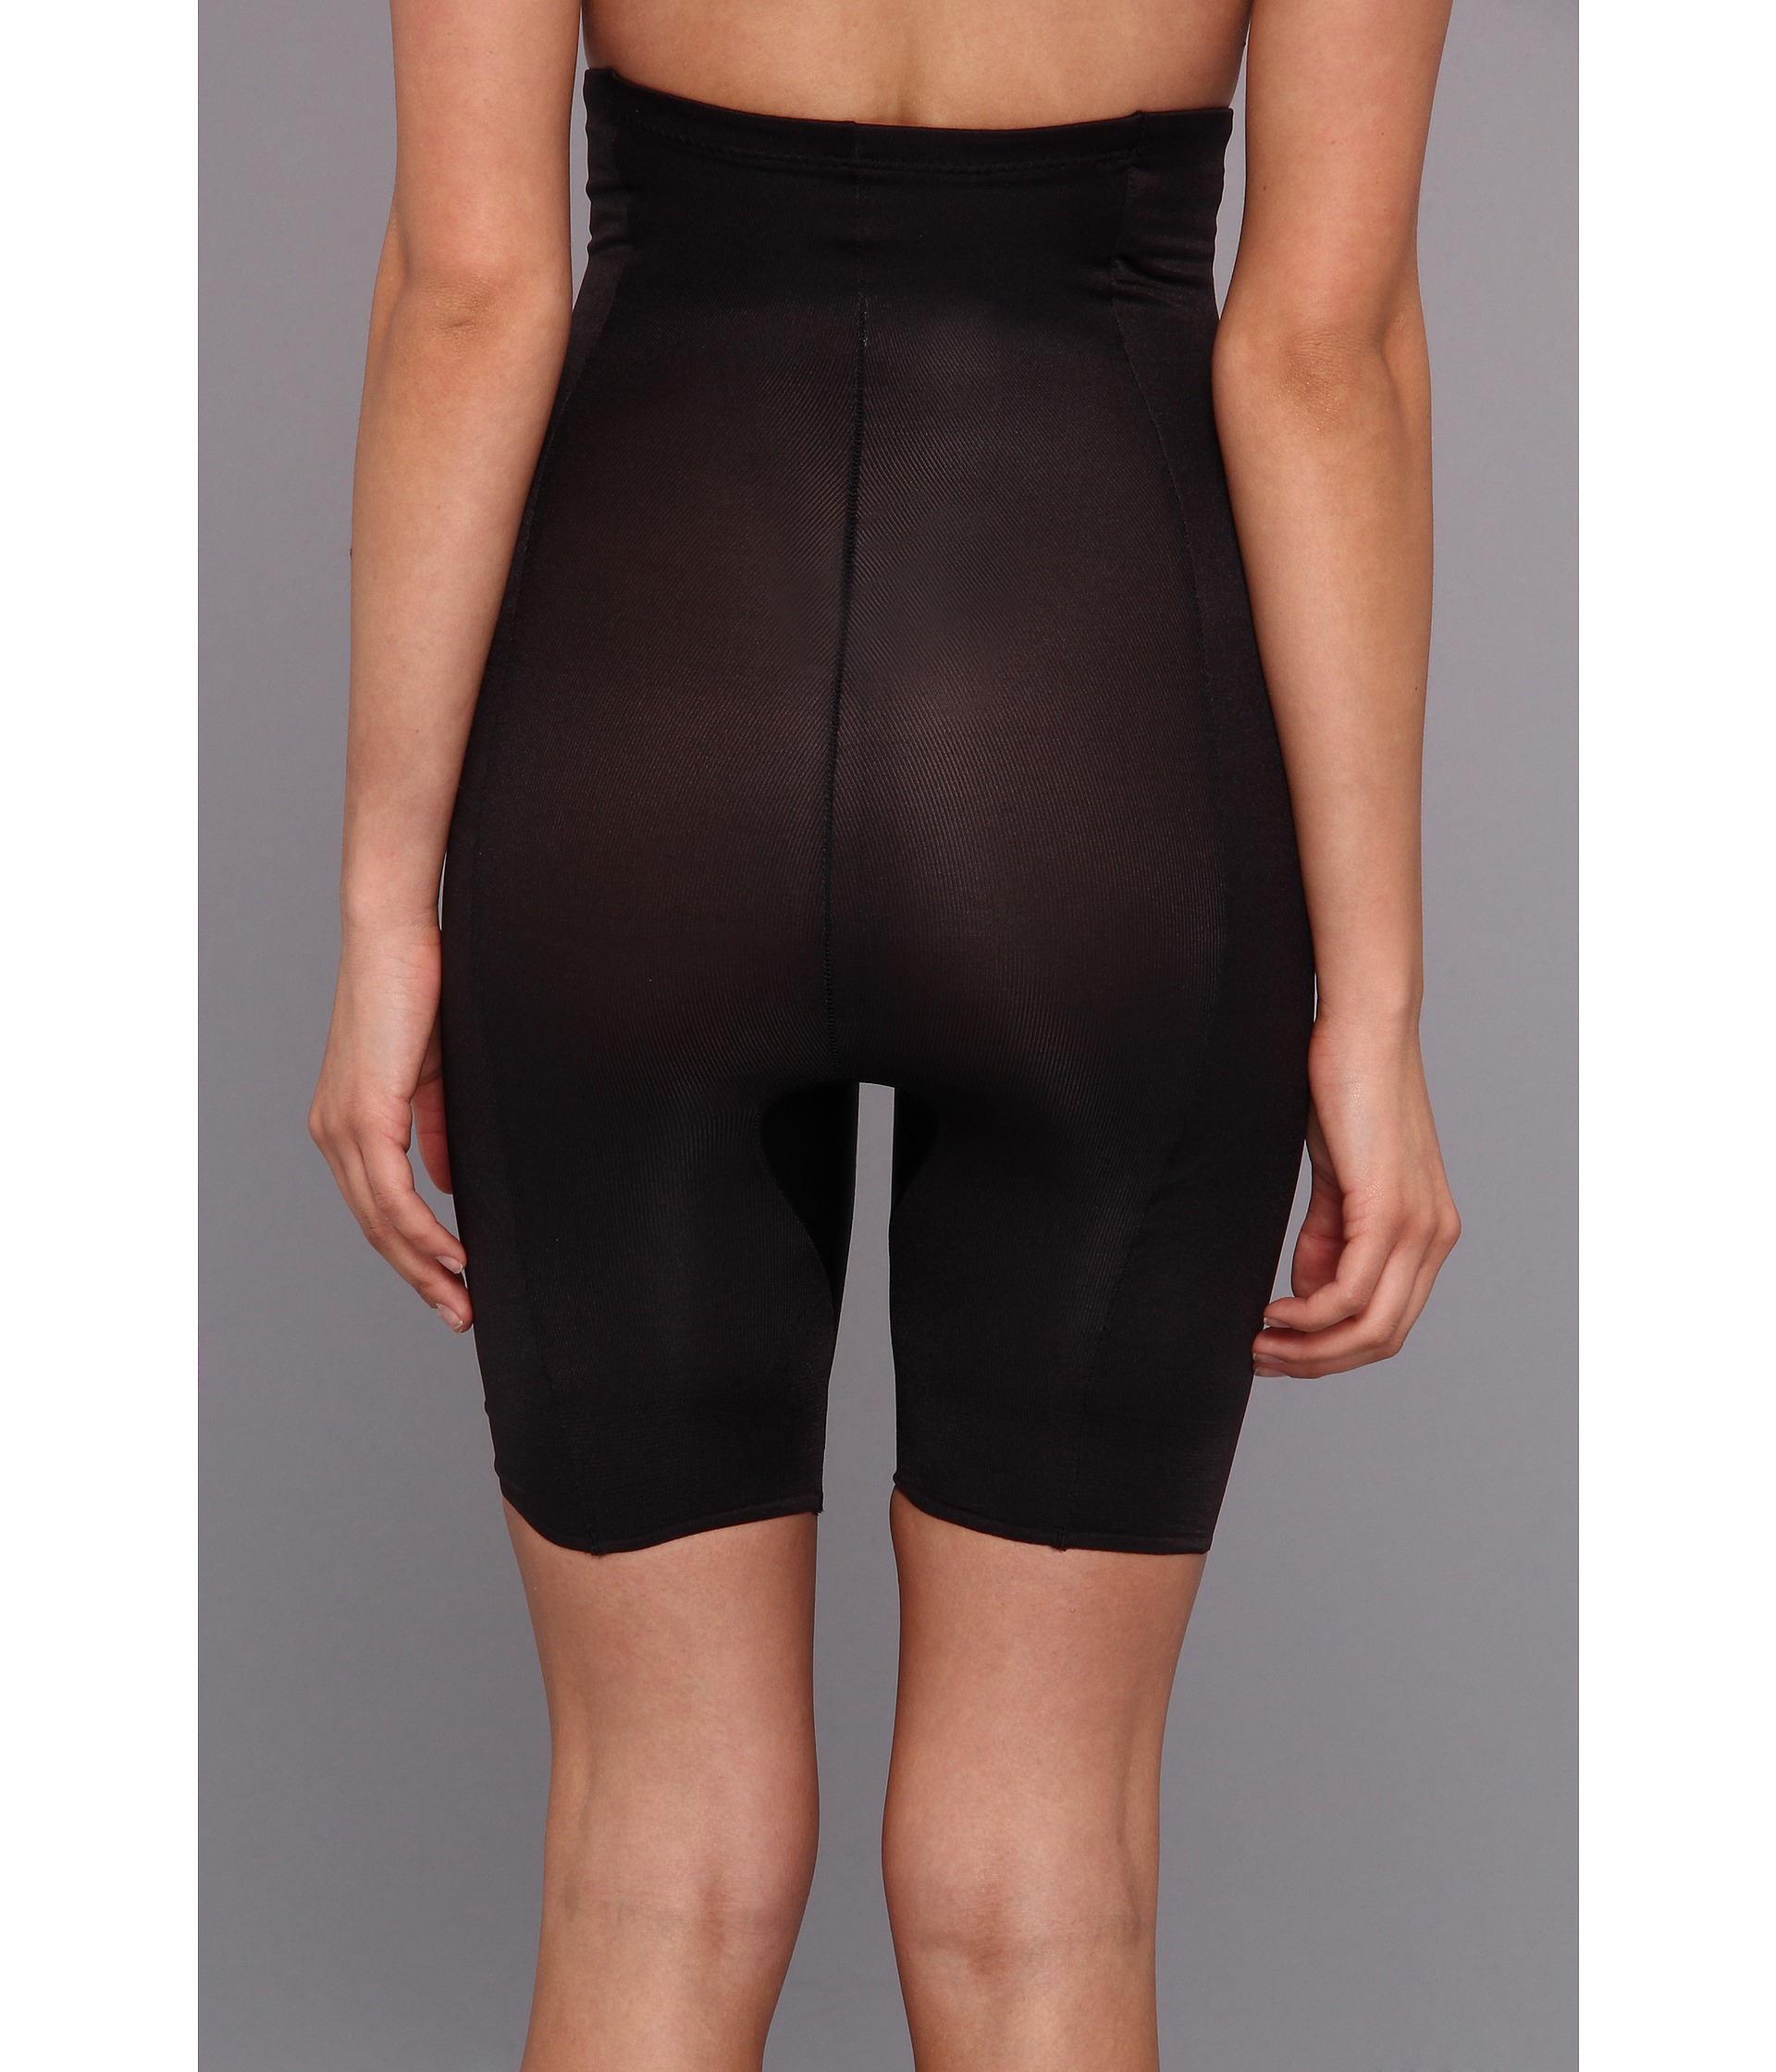 Tc Fine Intimates Even More® Triple-ply Midriff Hi-waist